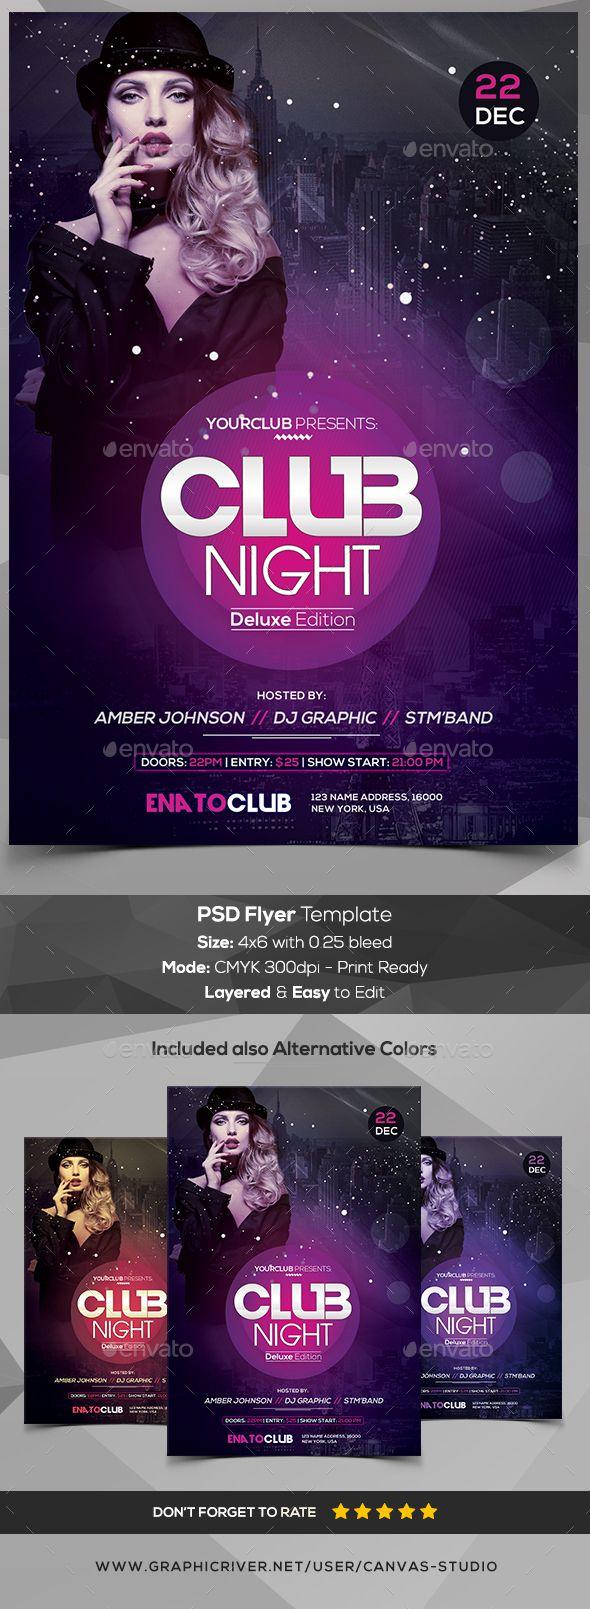 Club Party Flyer Templates Photoshop Downoad Timiznceptzmusic